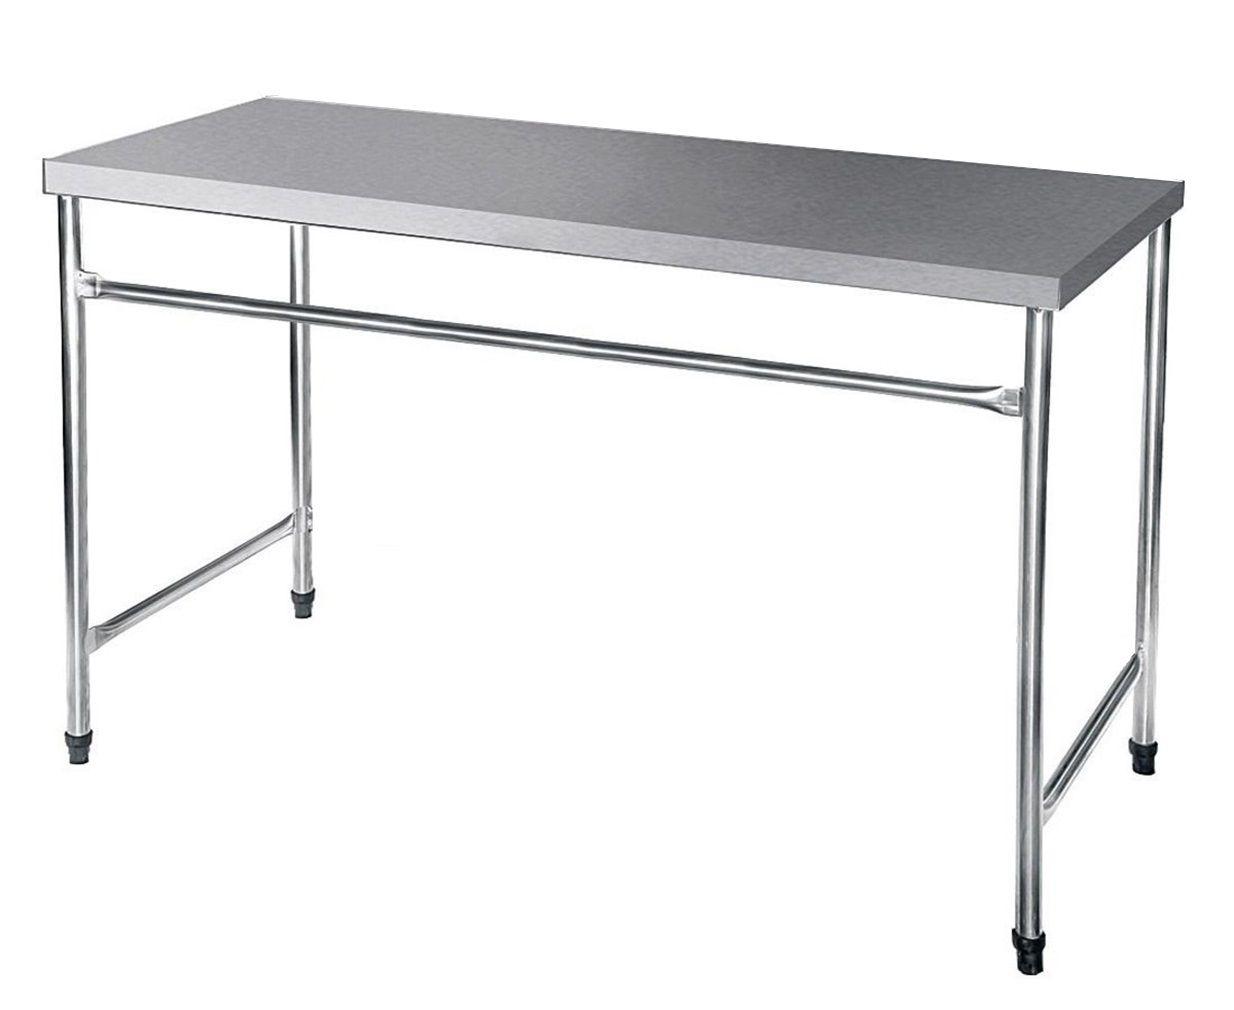 Bancada / Mesa Em Aço Inox (130x70x85)